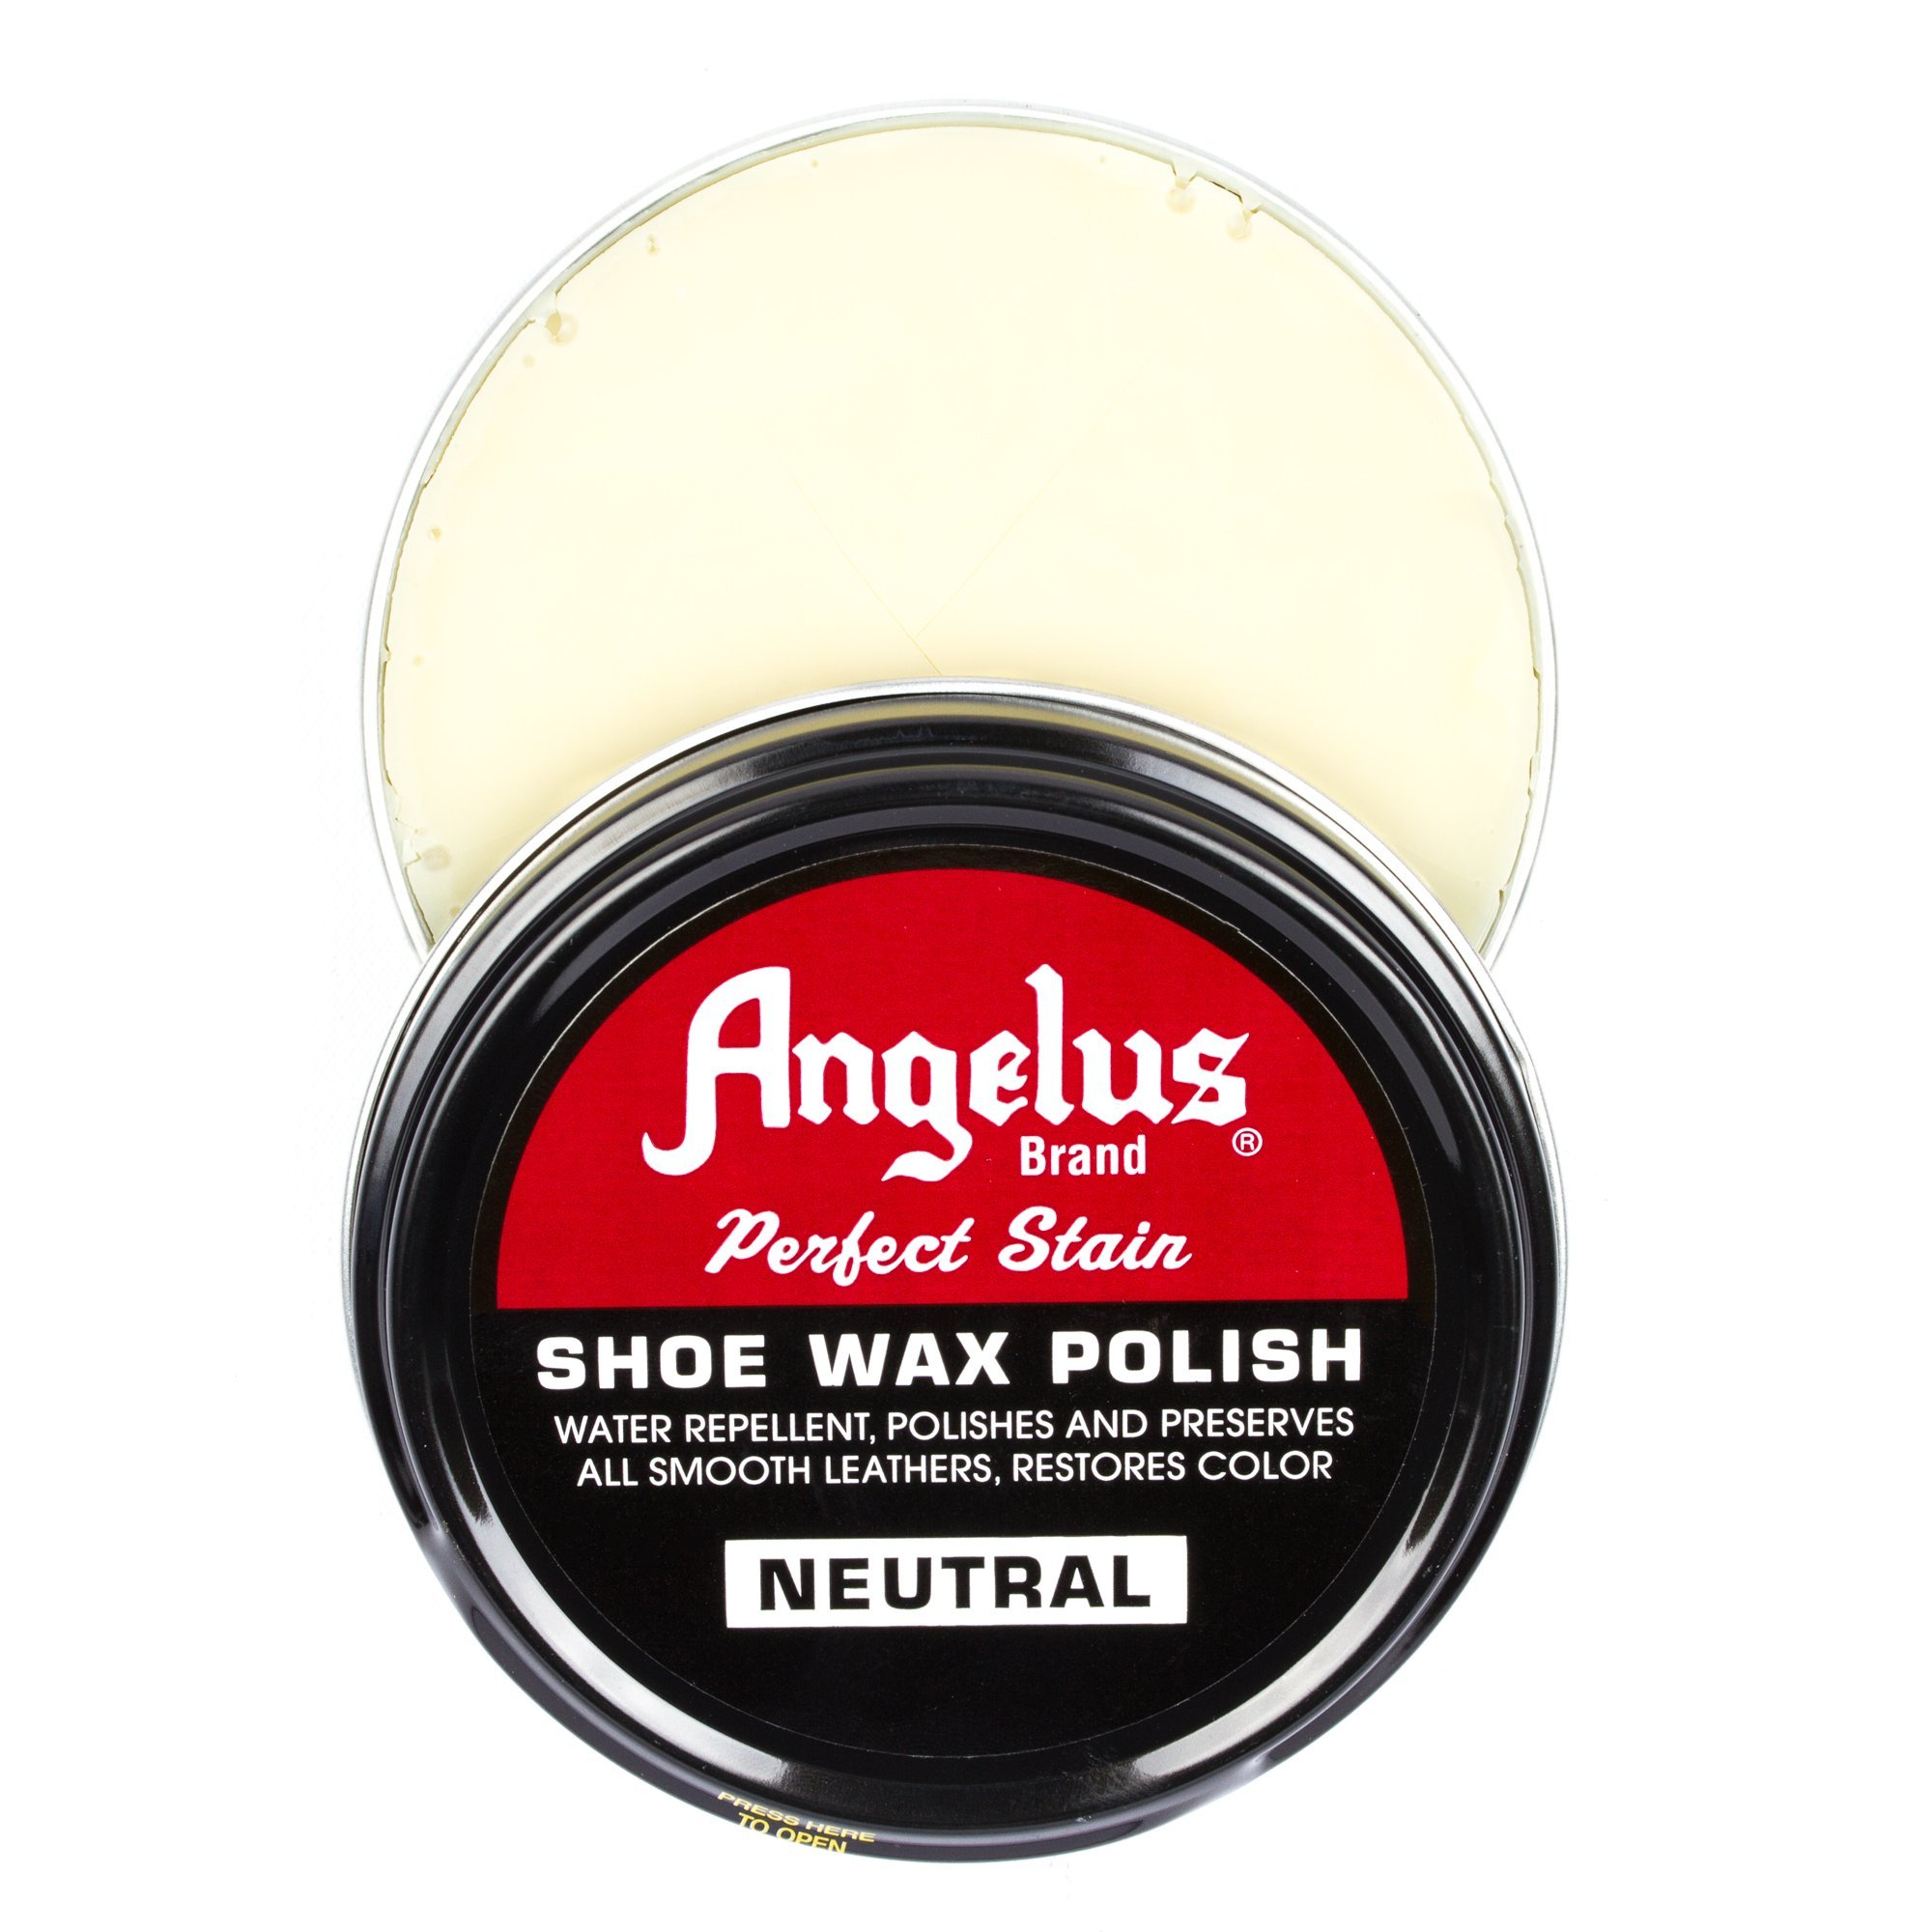 Angelus Neutral Shoe Wax Polish